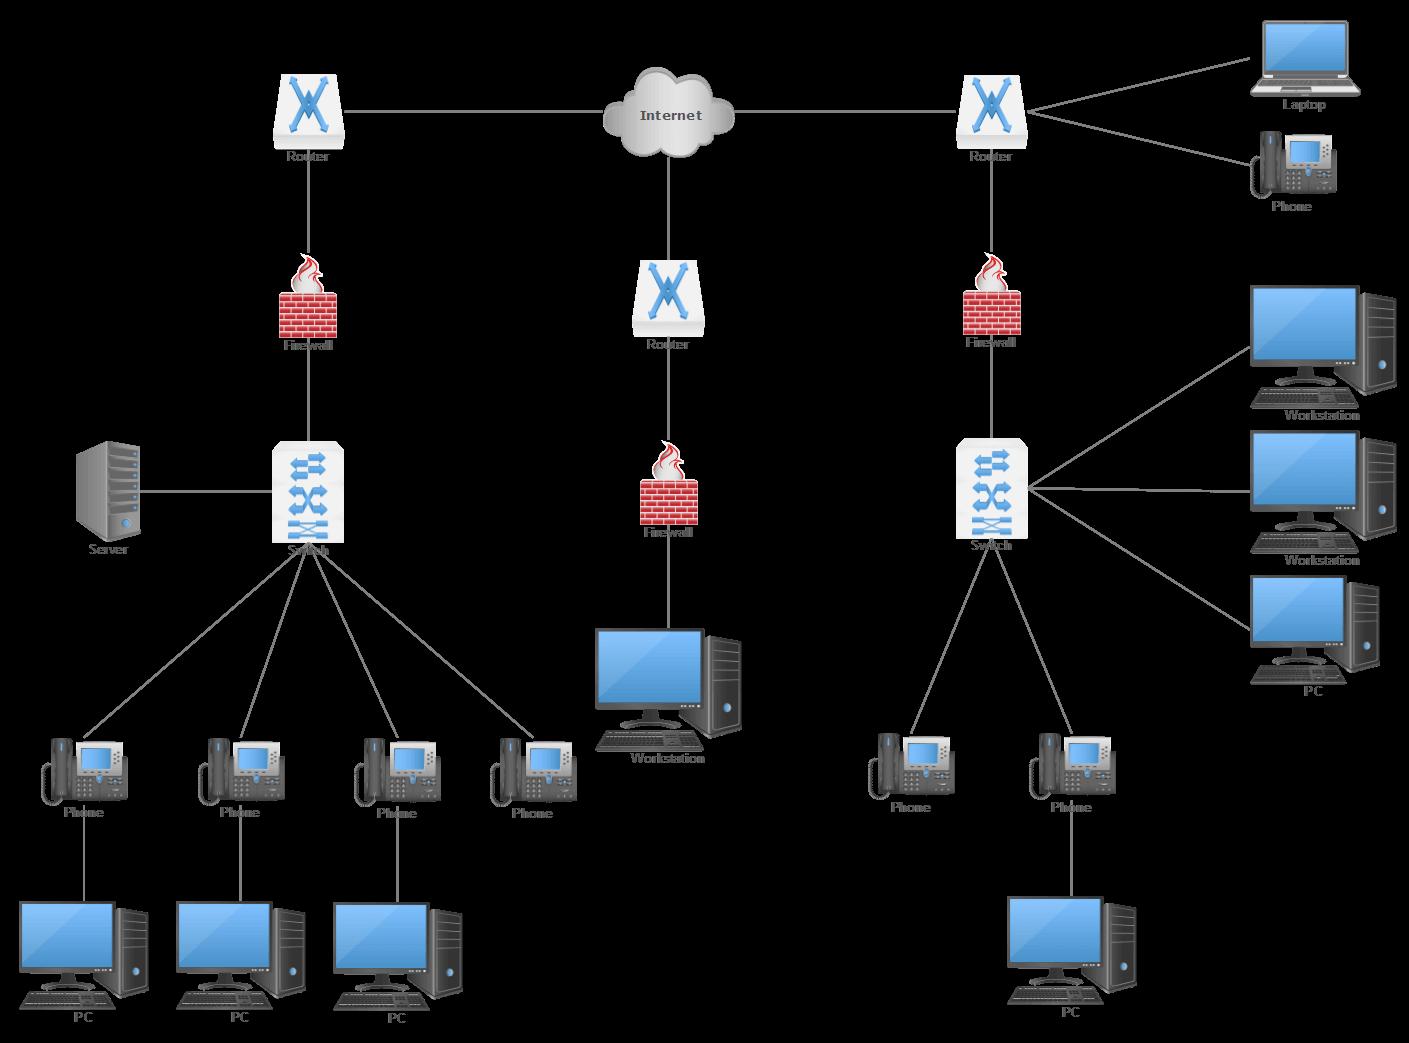 network diagram software free download or network diagram online rh smartdraw com draw a diagram online free draw a diagram from ldif